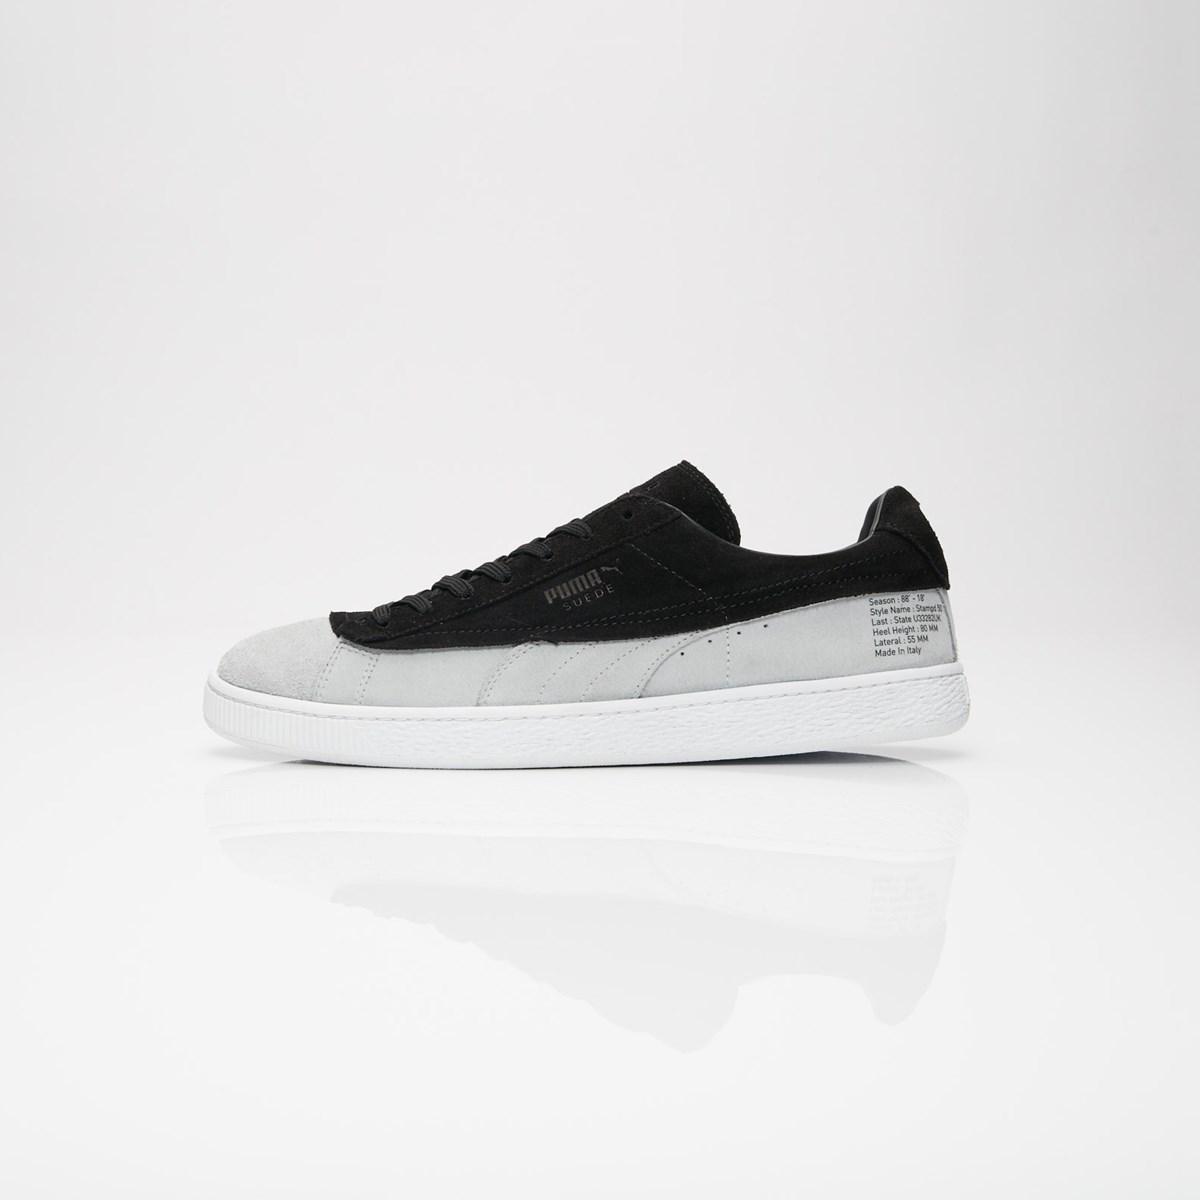 07e1e8290e9c4d Puma Suede Classic x Stampd - 366327-01 - Sneakersnstuff